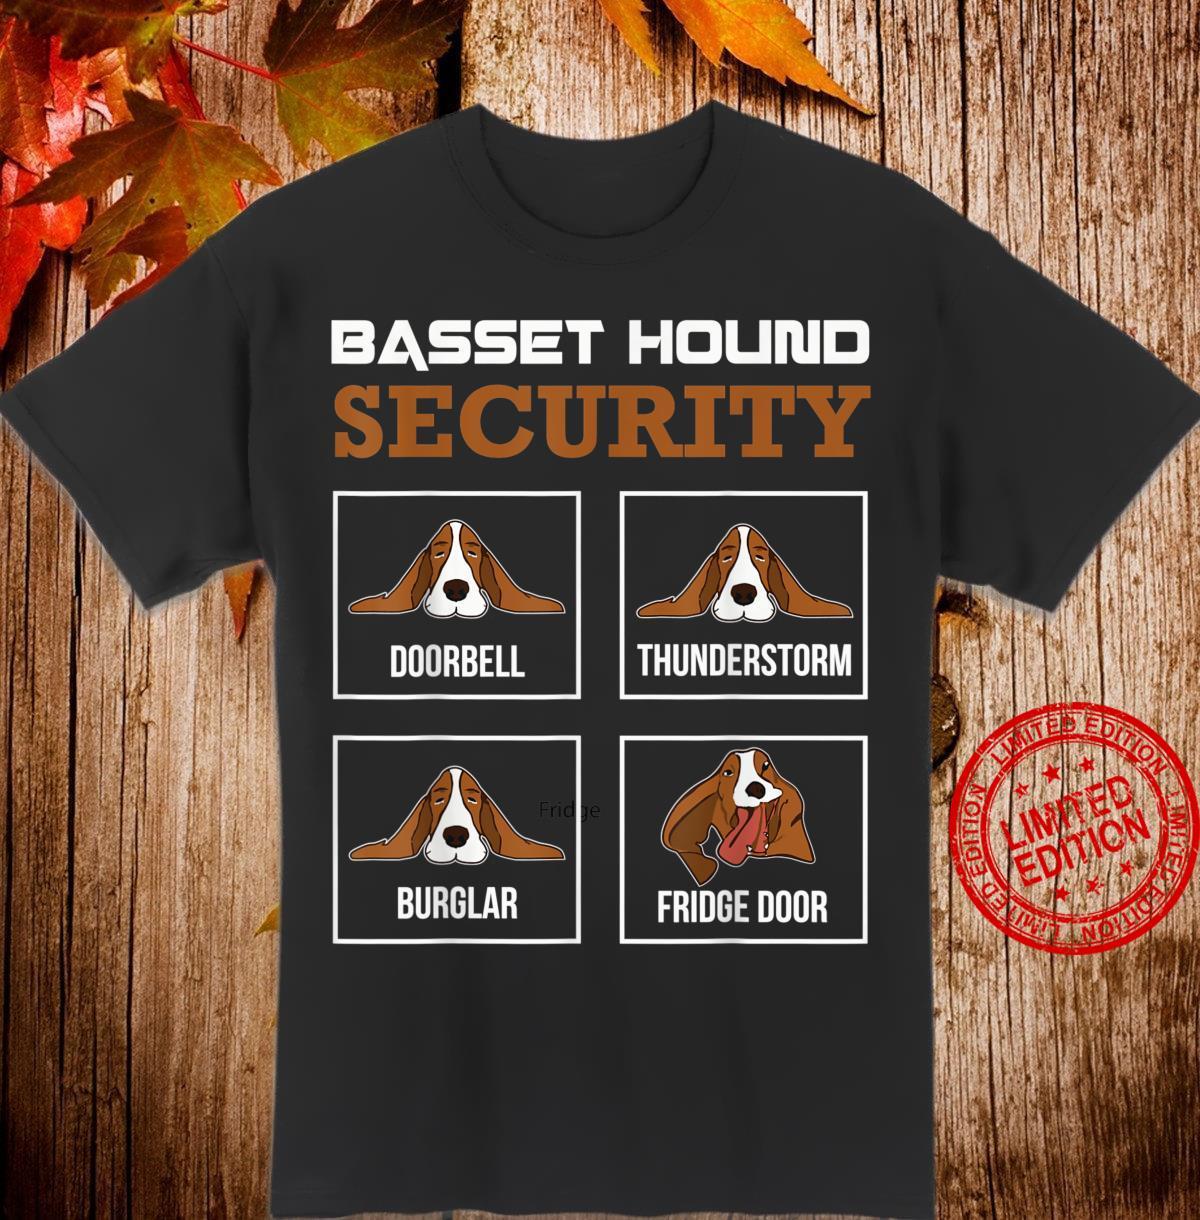 Bassett Hounds Basset Hound Basset Hound Shirt